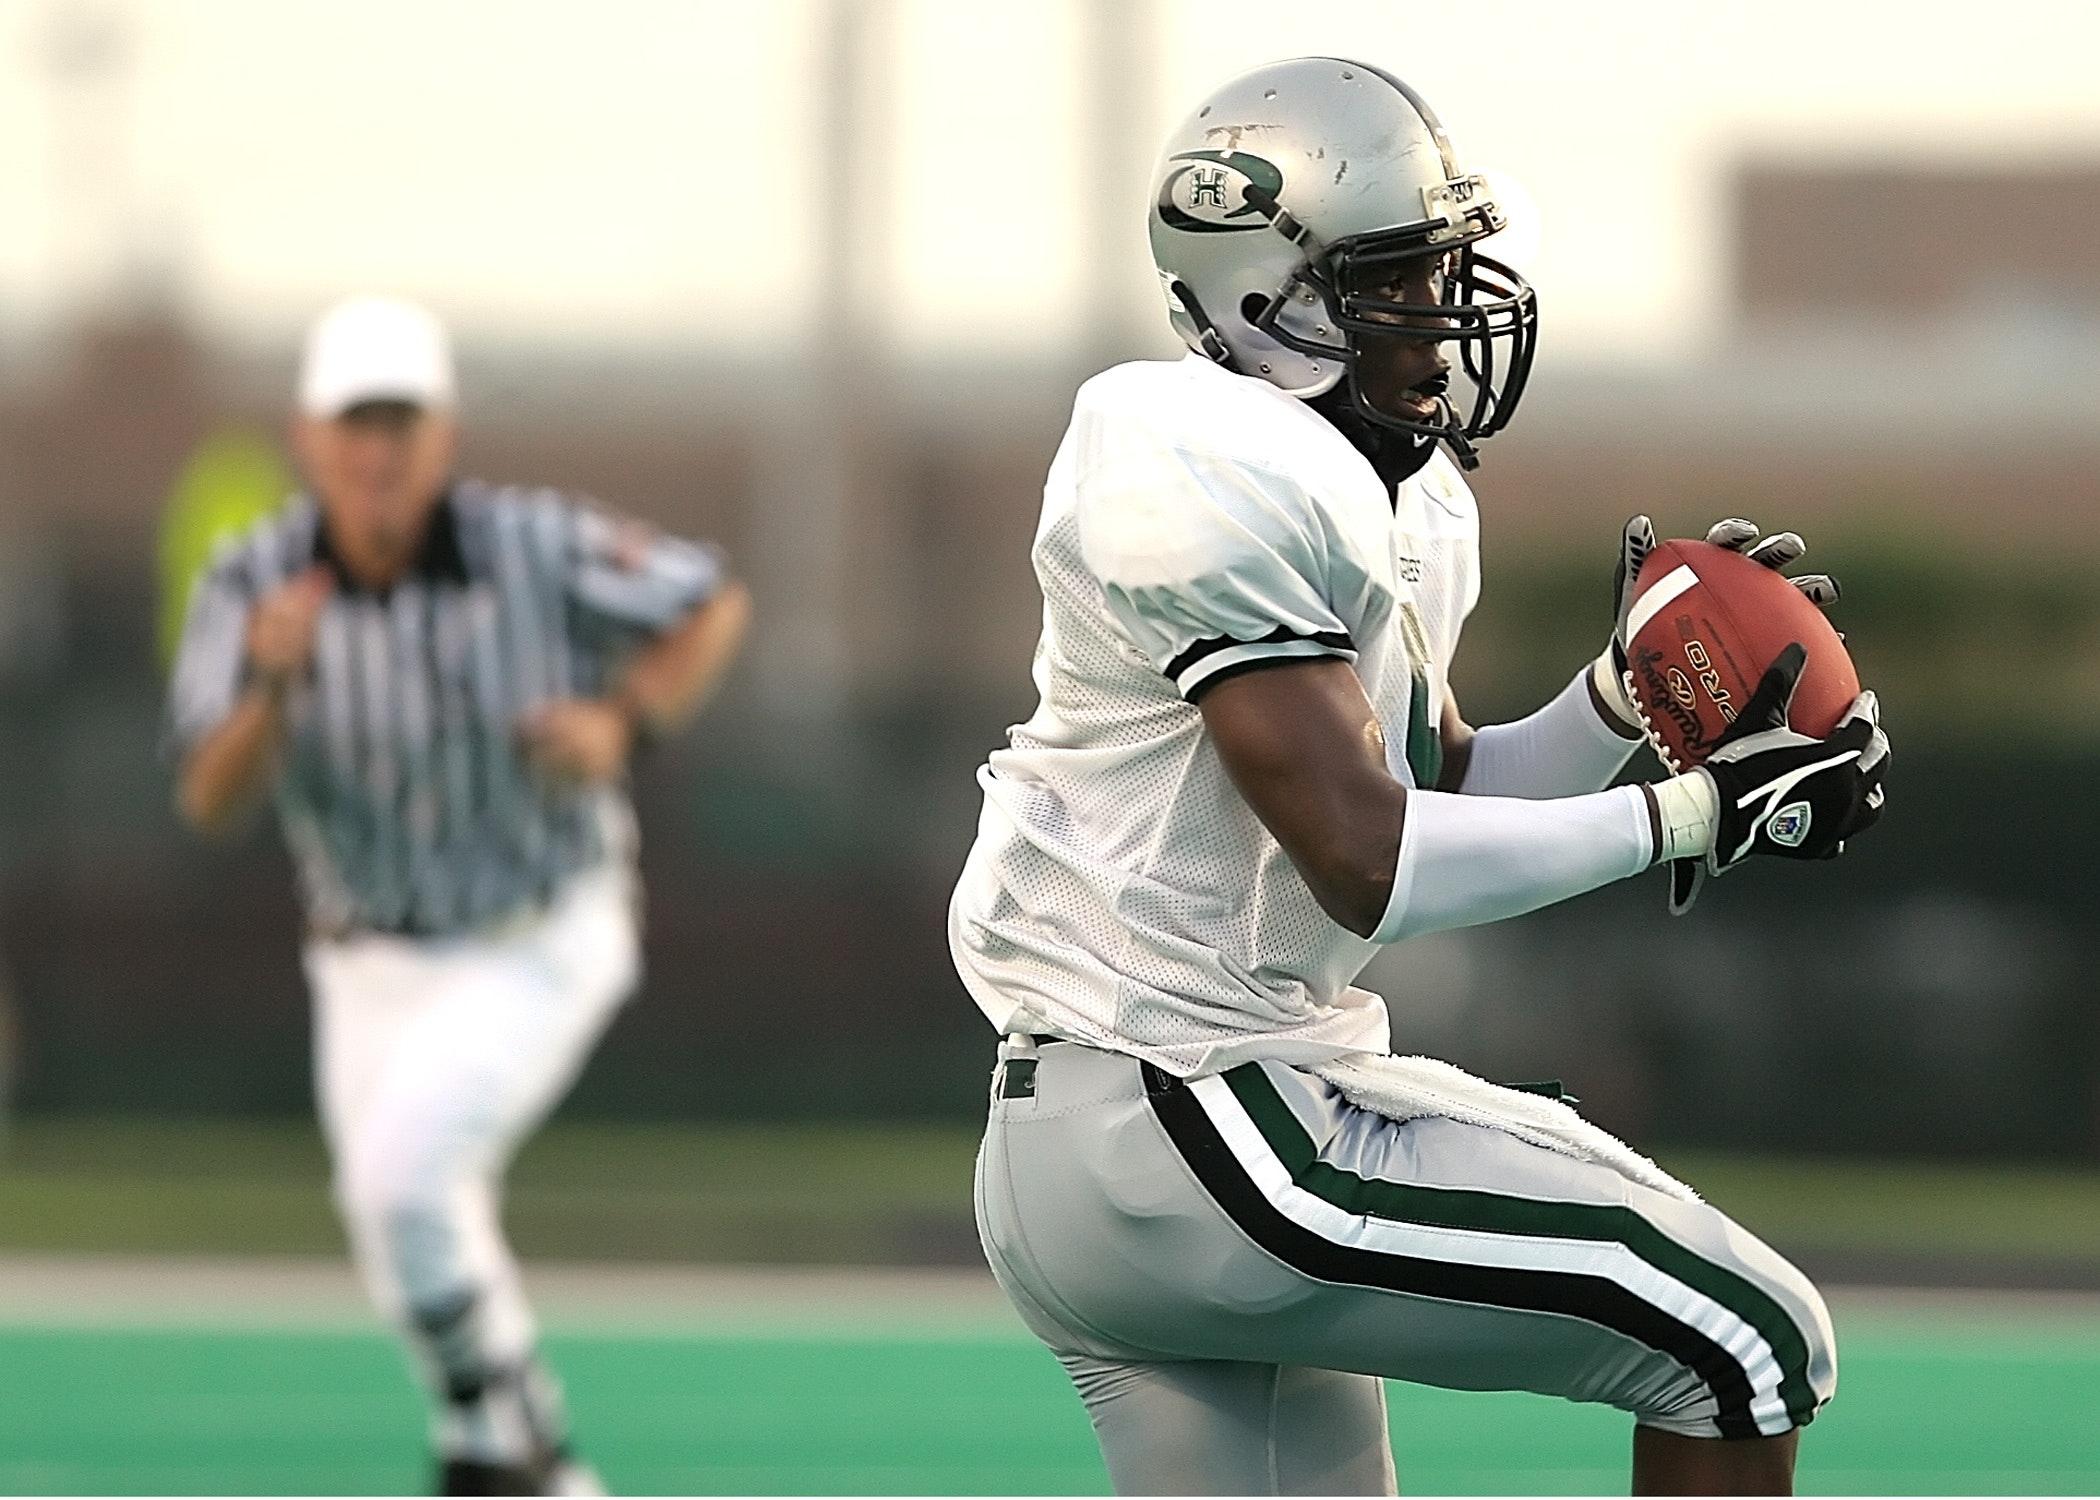 action-american-football-athlete-209961.jpg